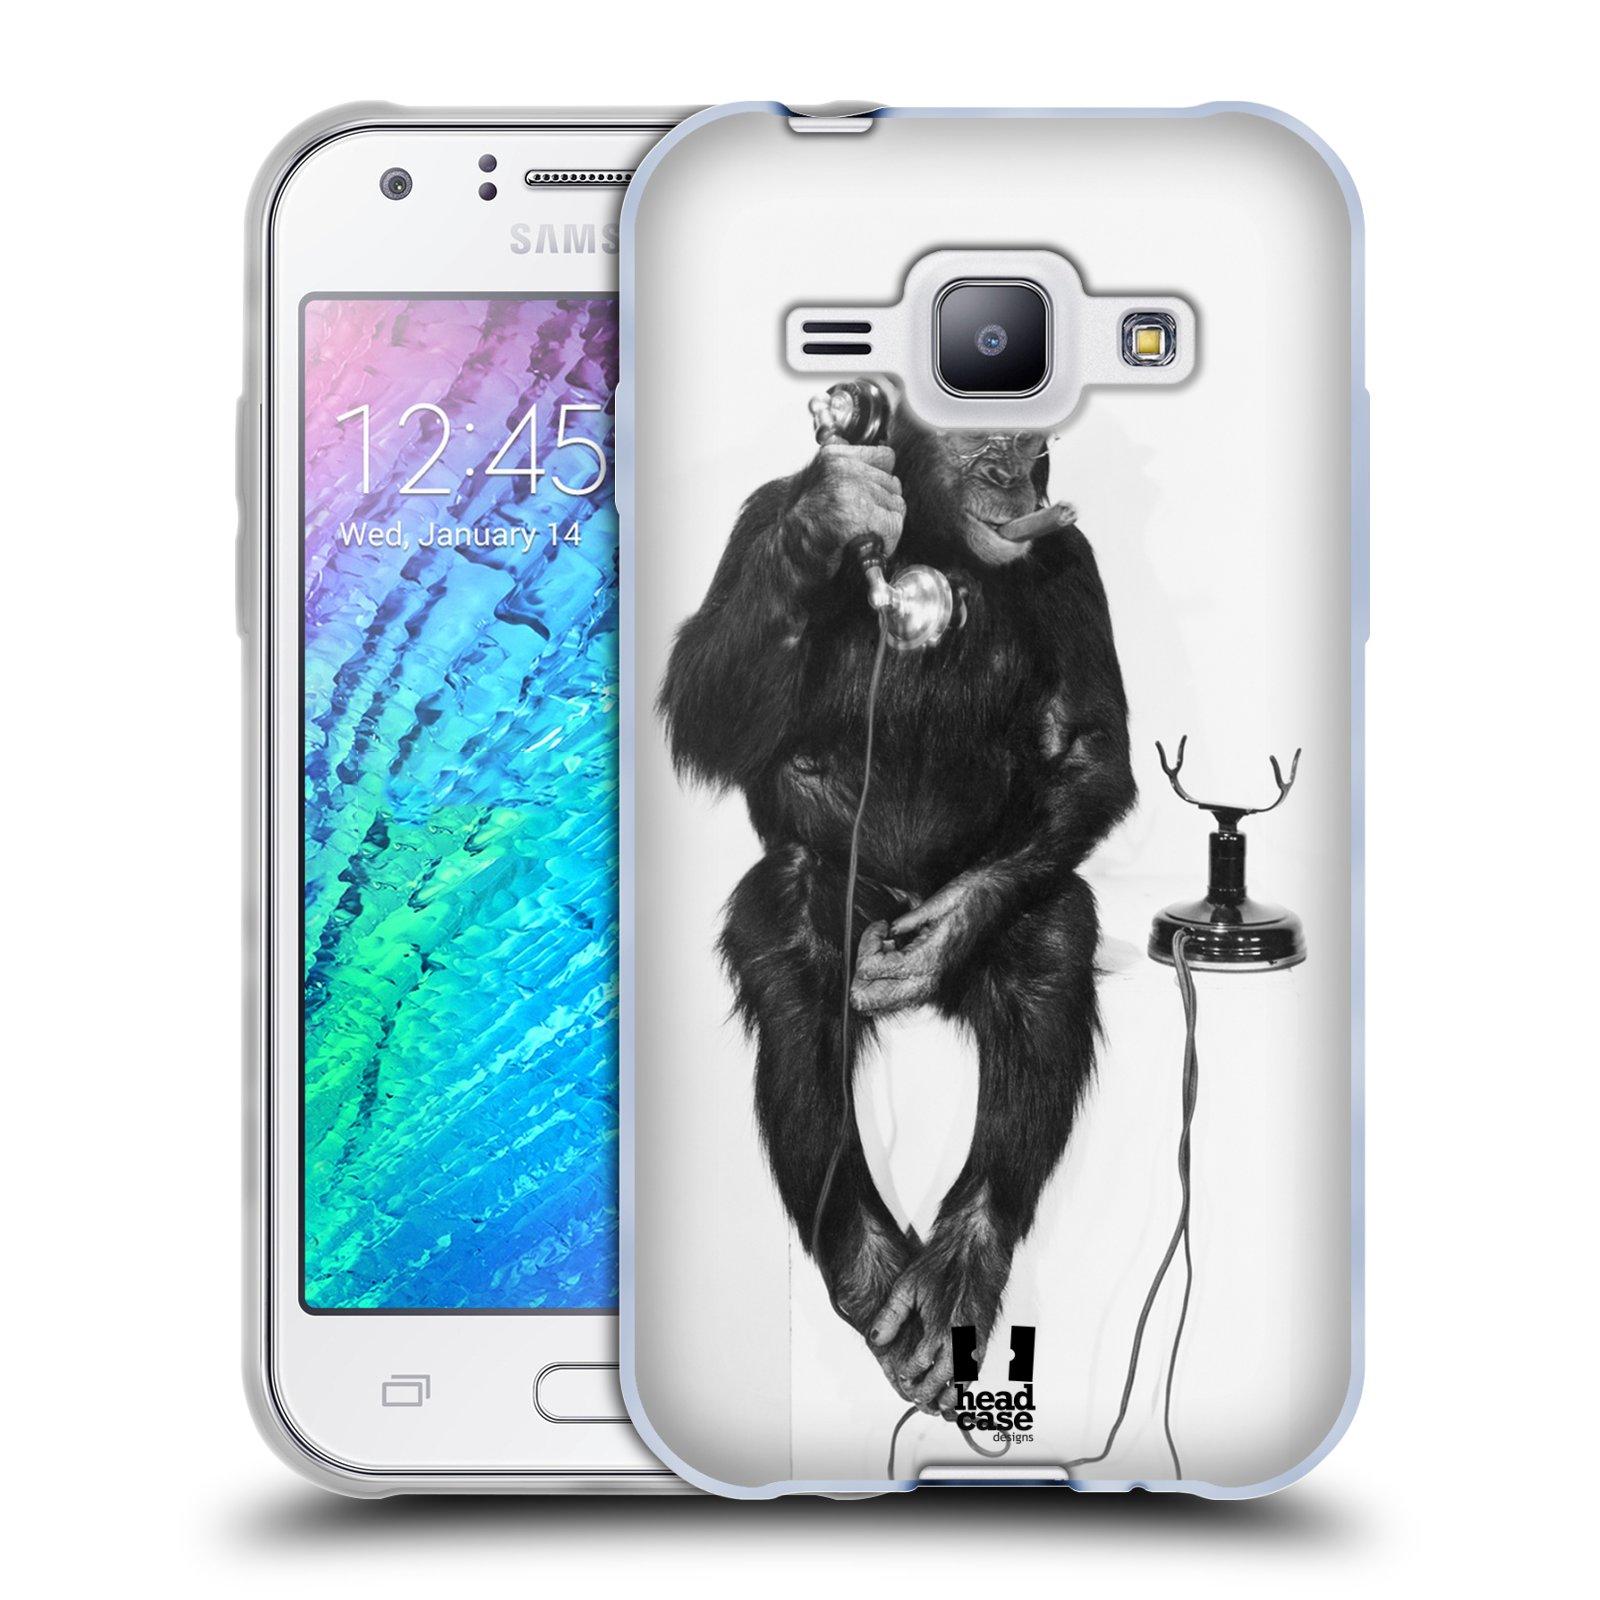 Silikonové pouzdro na mobil Samsung Galaxy J1 HEAD CASE OPIČÁK S TELEFONEM (Silikonový kryt či obal na mobilní telefon Samsung Galaxy J1 a J1 Duos)